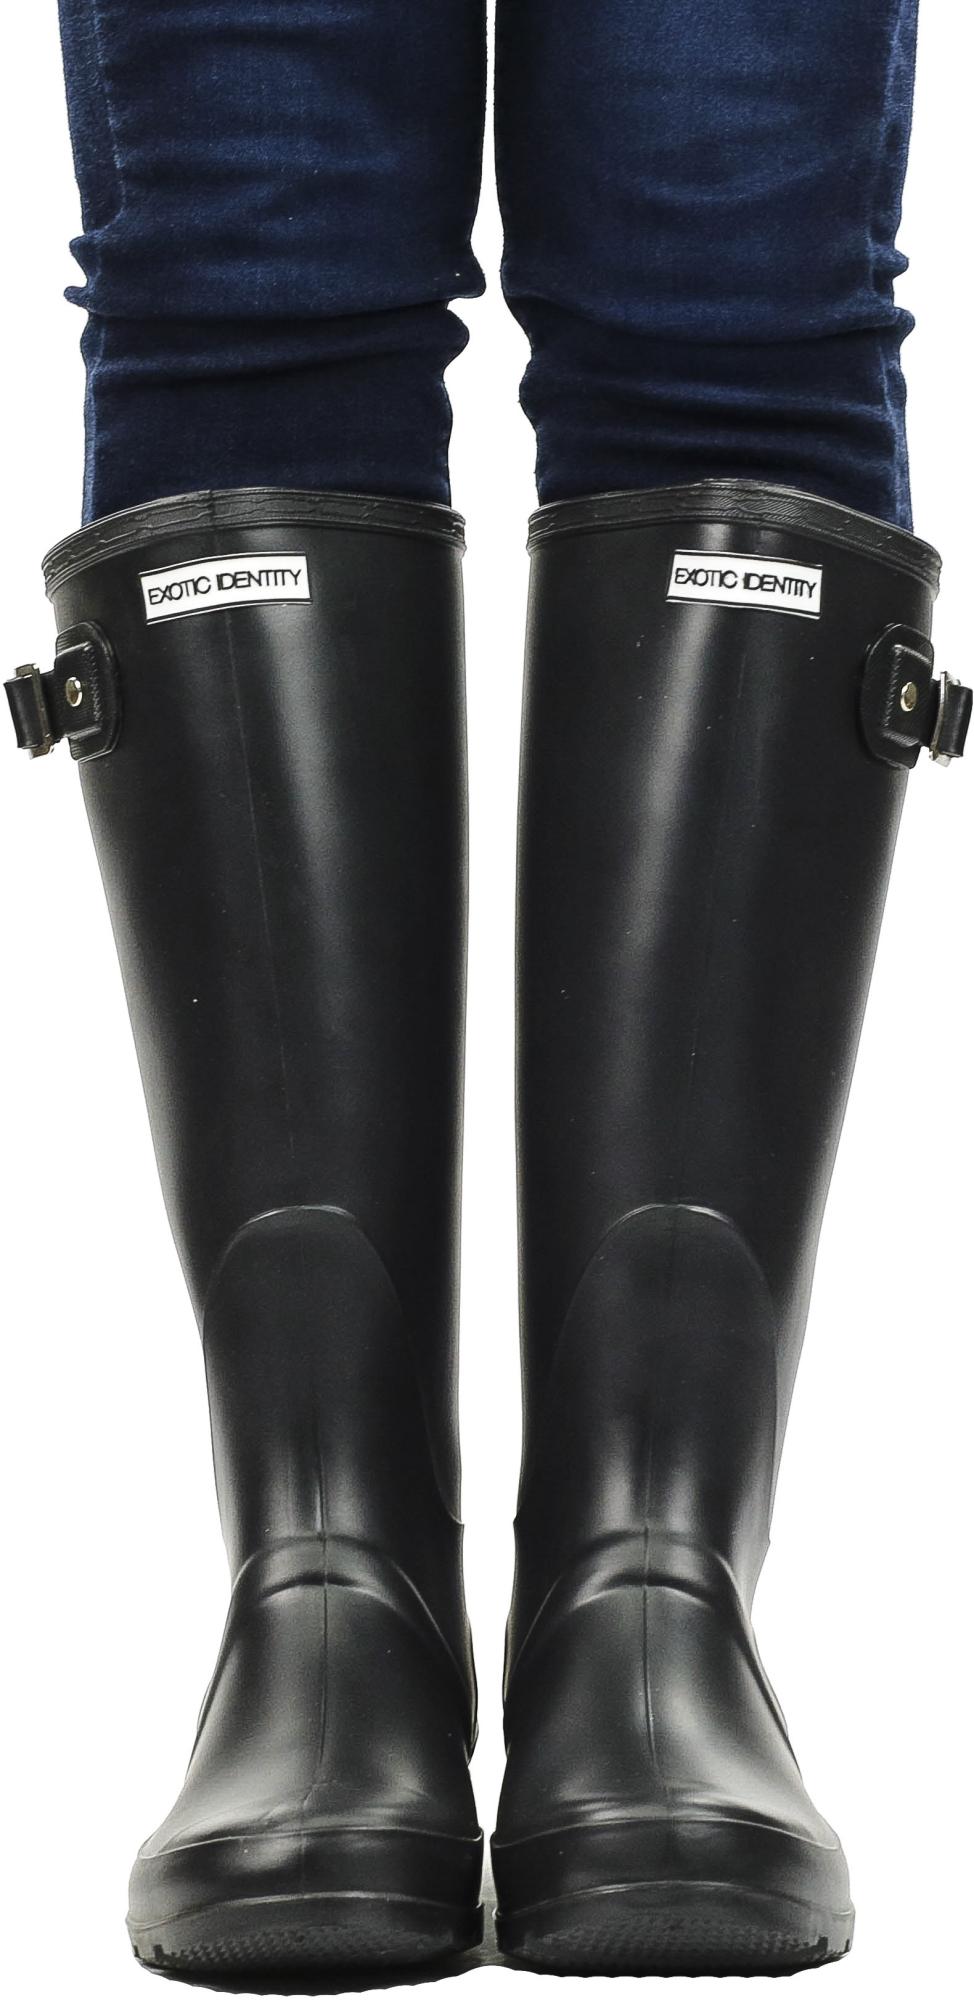 Exotic-Identity-Original-Tall-Rain-Boots-Waterproof-Premium-PVC-Nonslip-So thumbnail 26